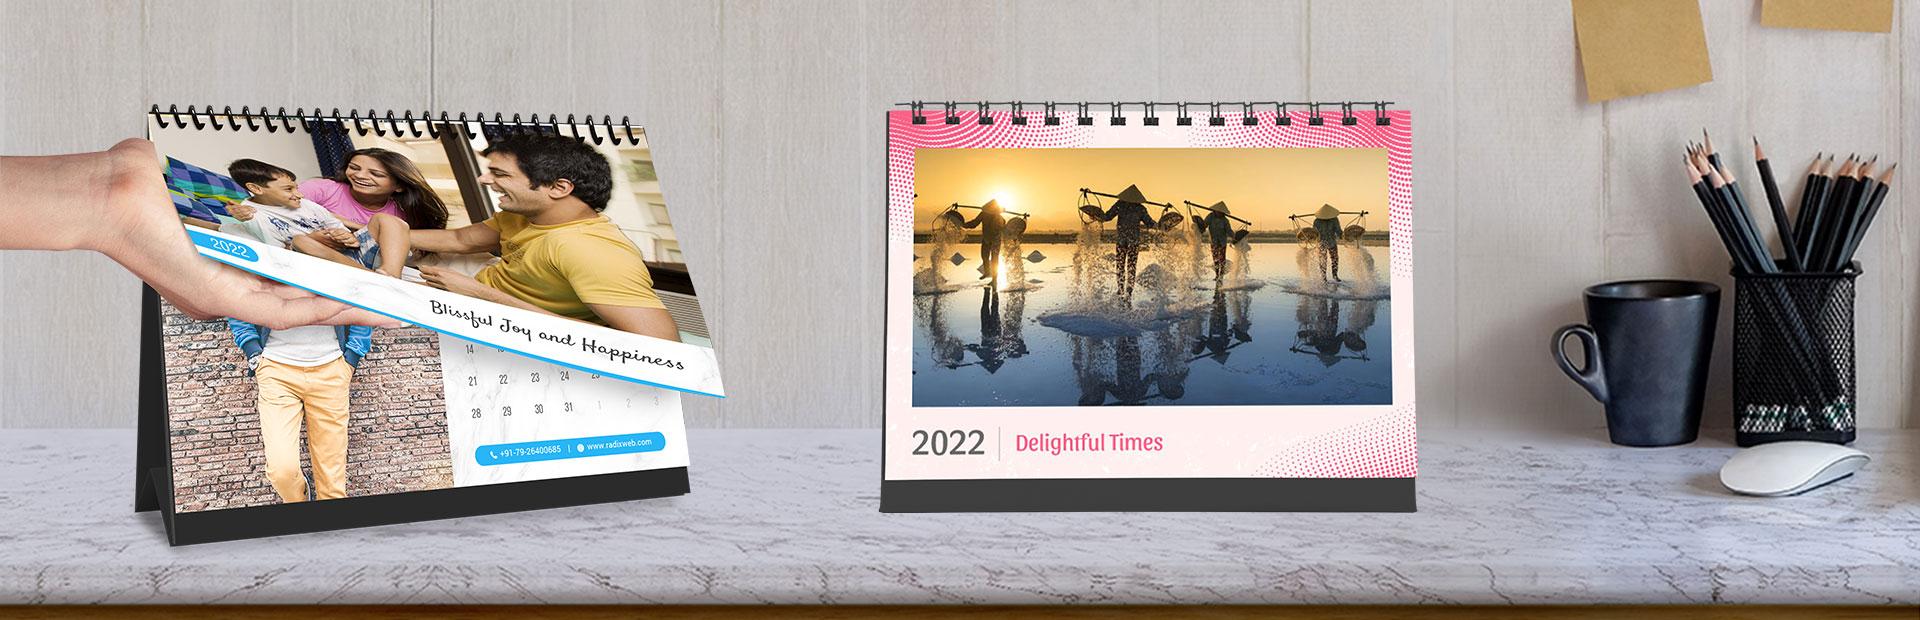 Classic Desk Calendars Online